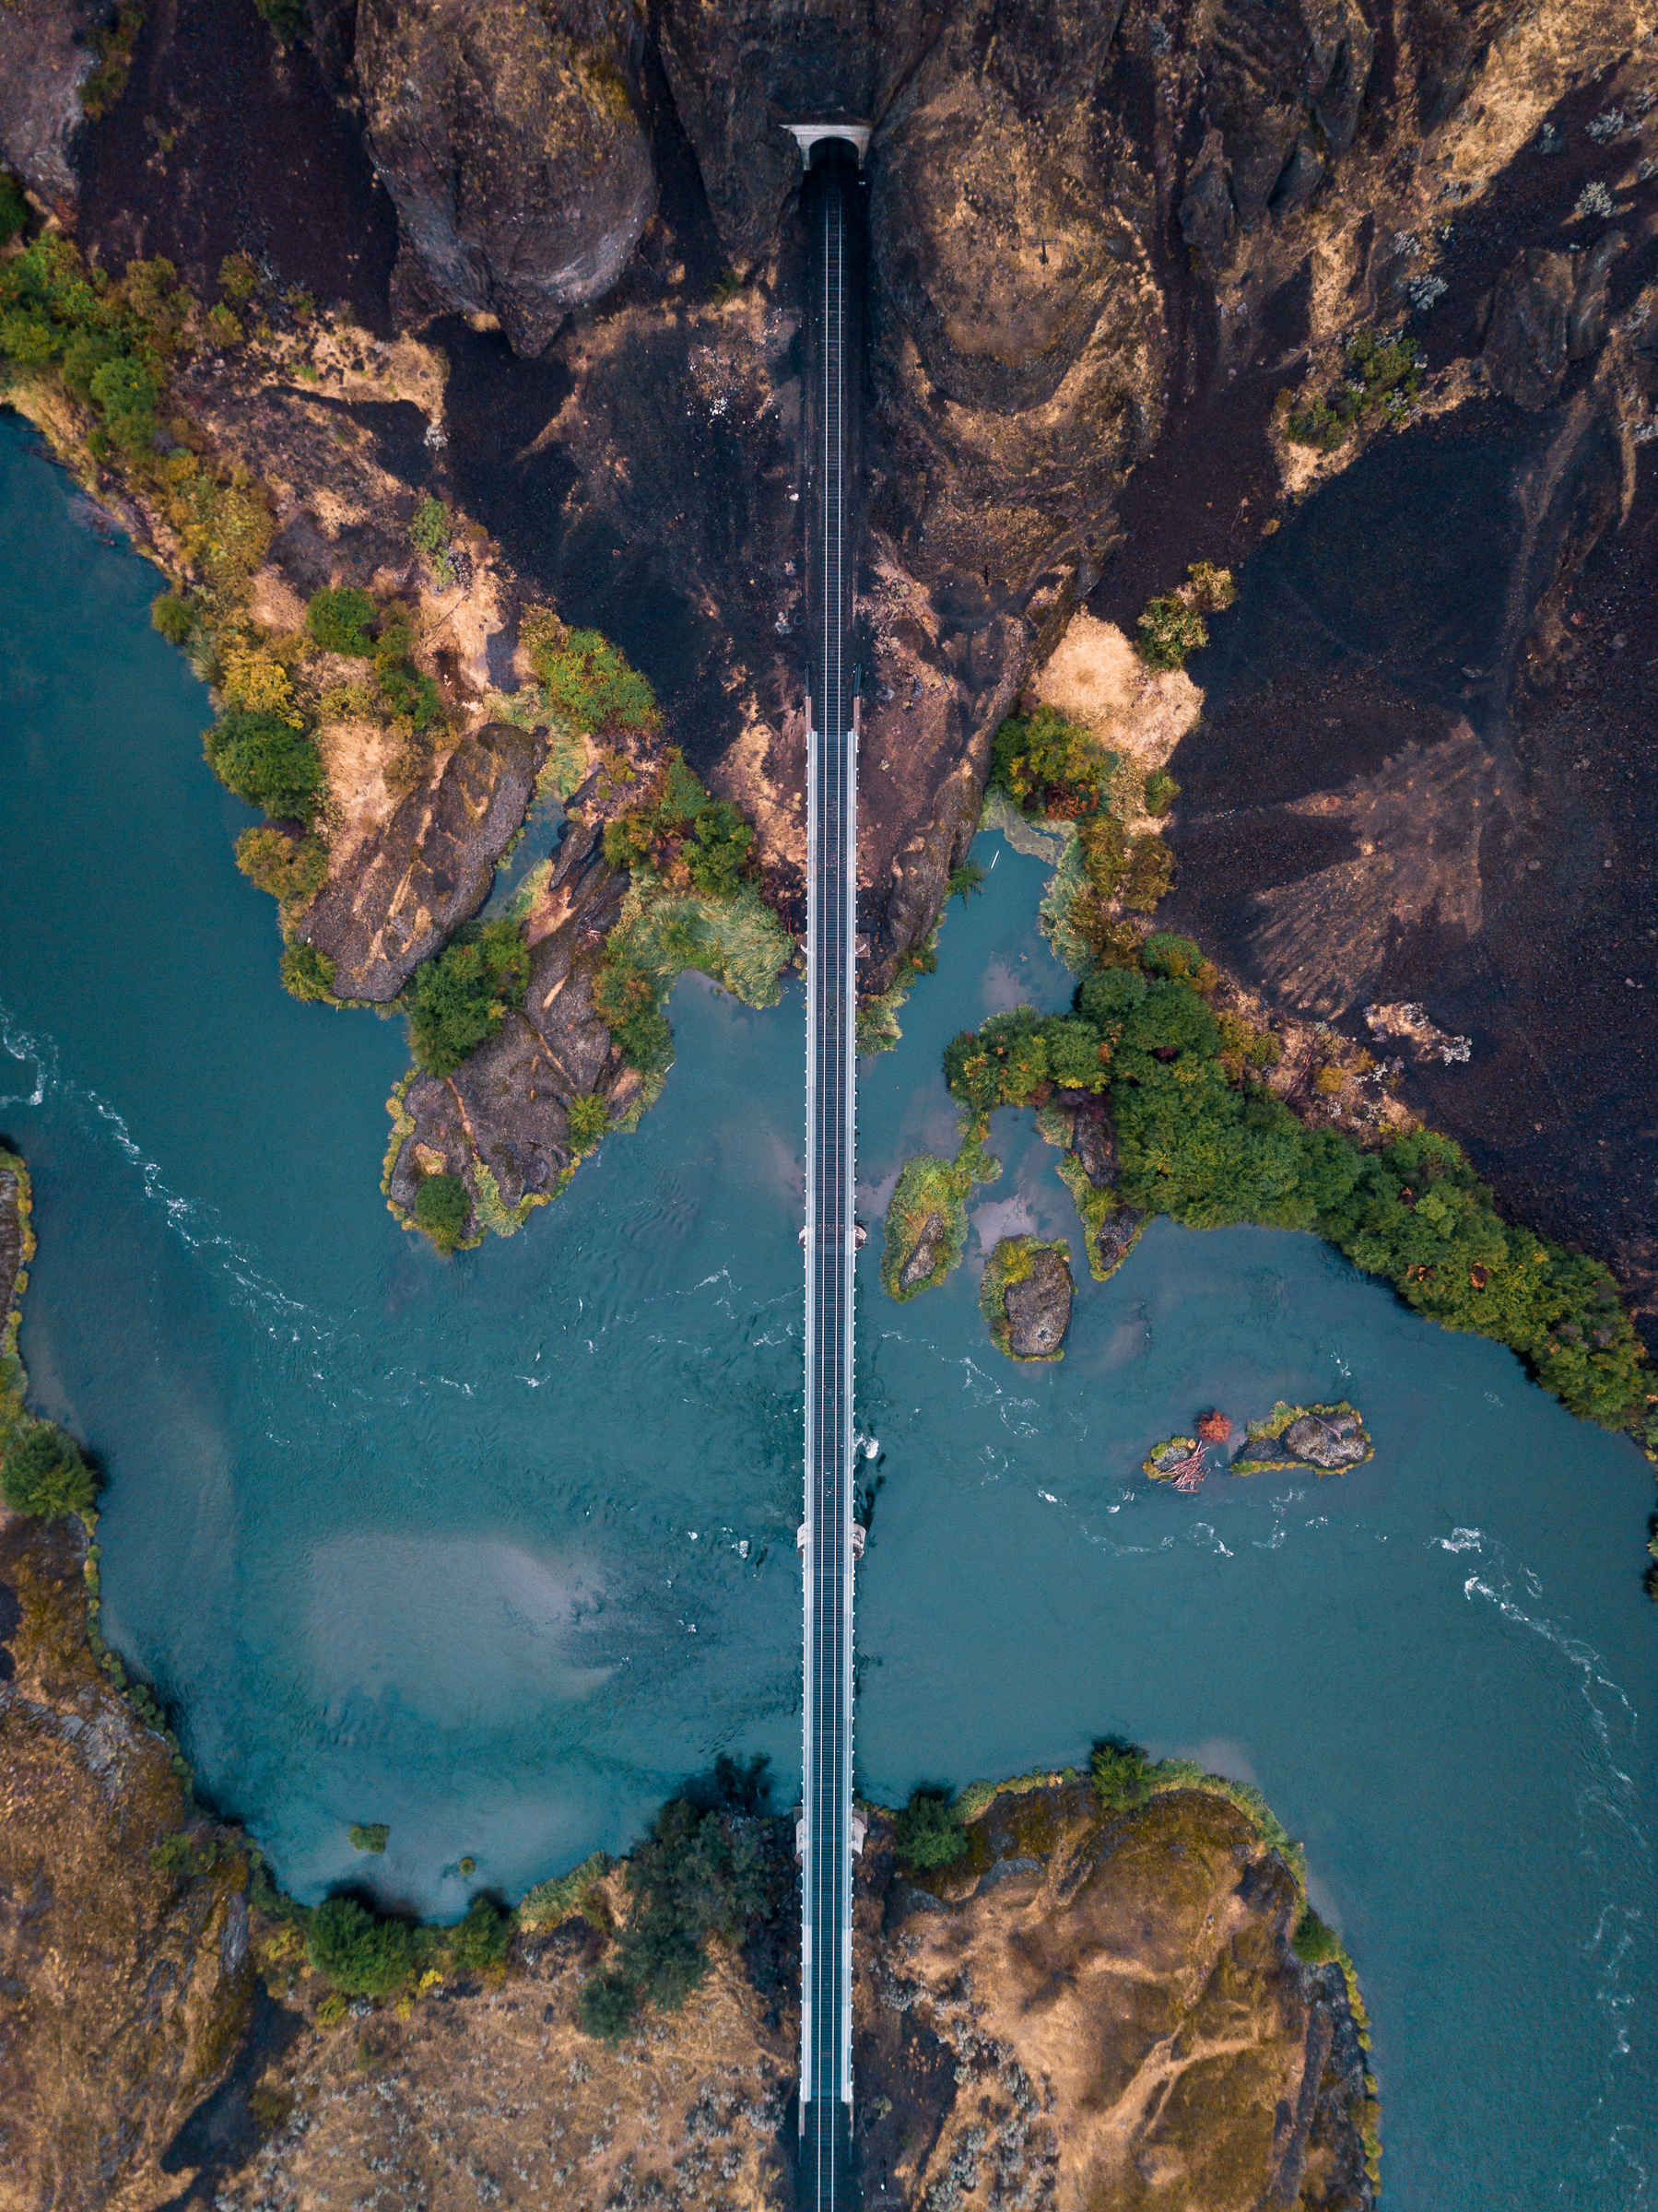 railroadmountainsstraightdown_typoland_aerial-1.jpg